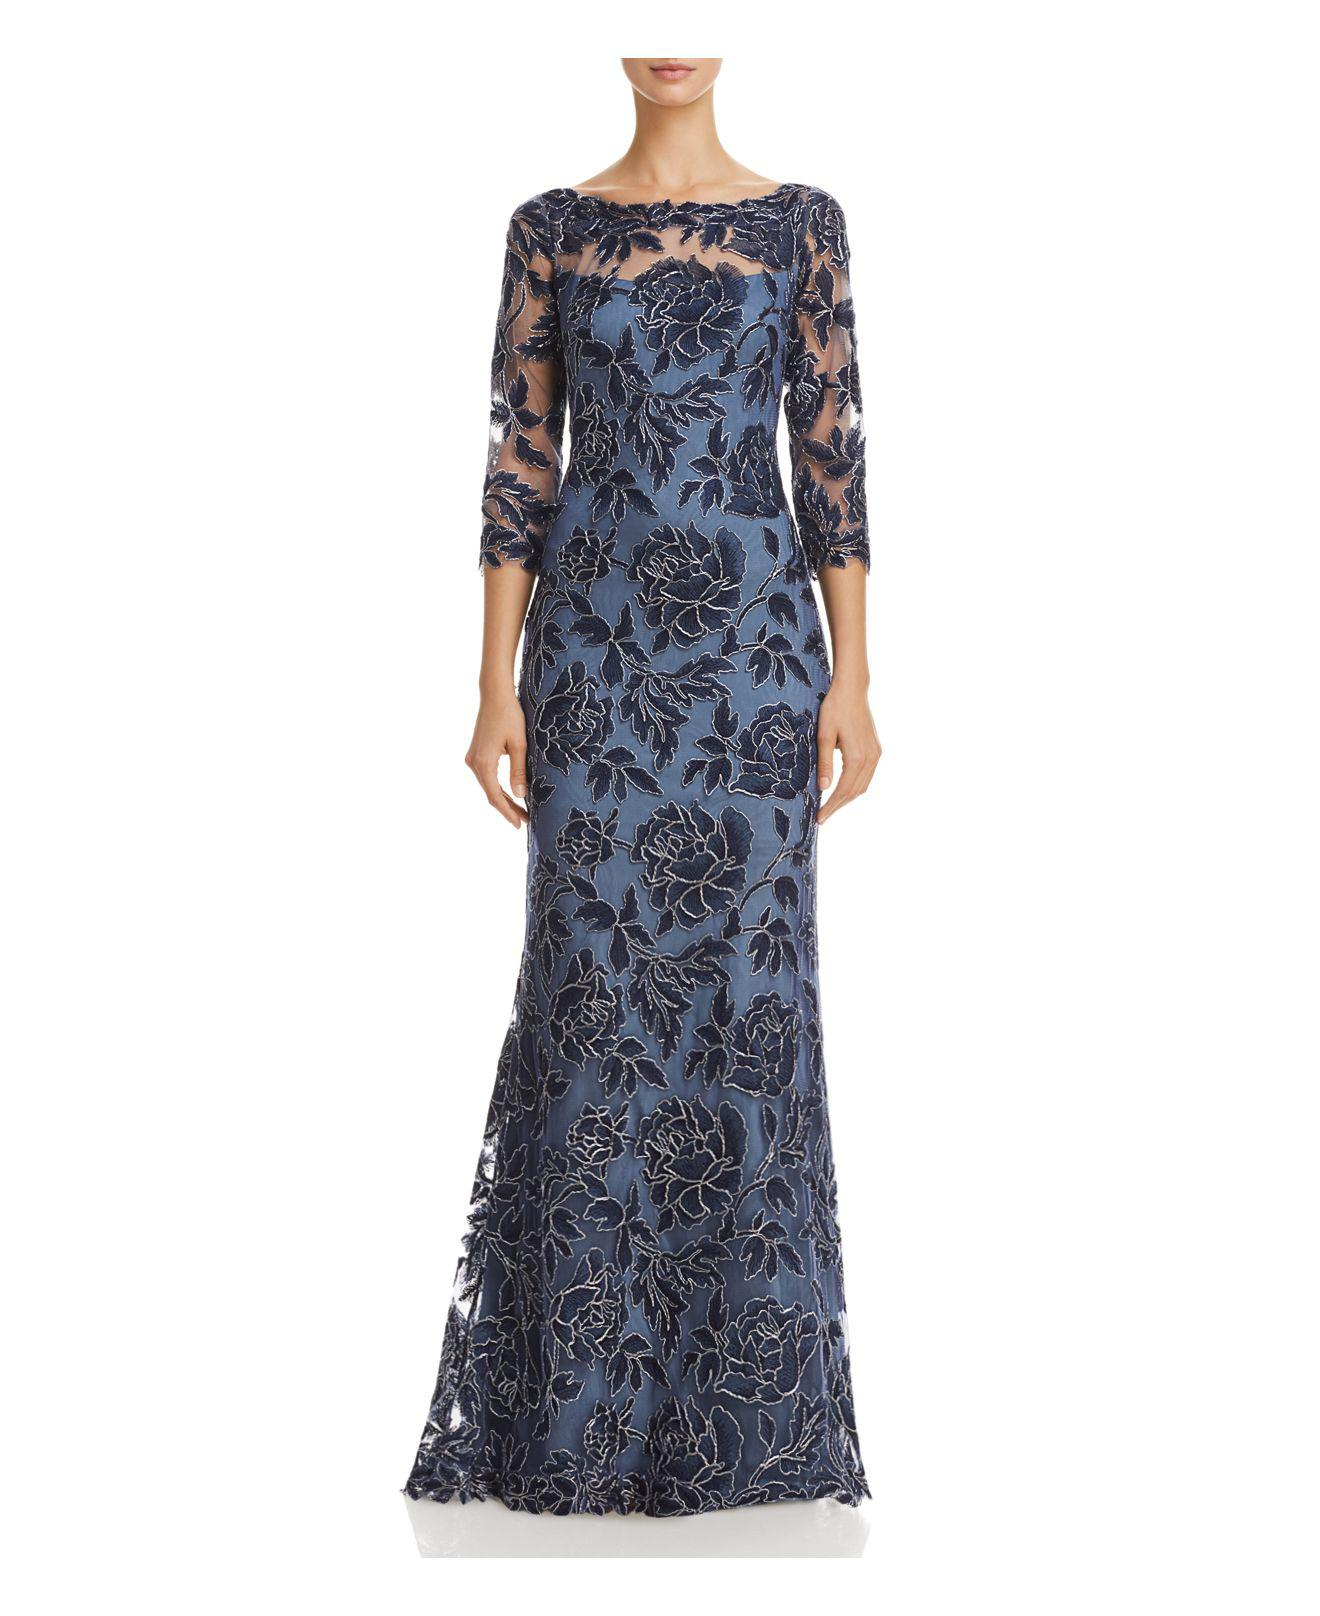 Tadashi Shoji. Women's Blue Embroidered Lace Gown